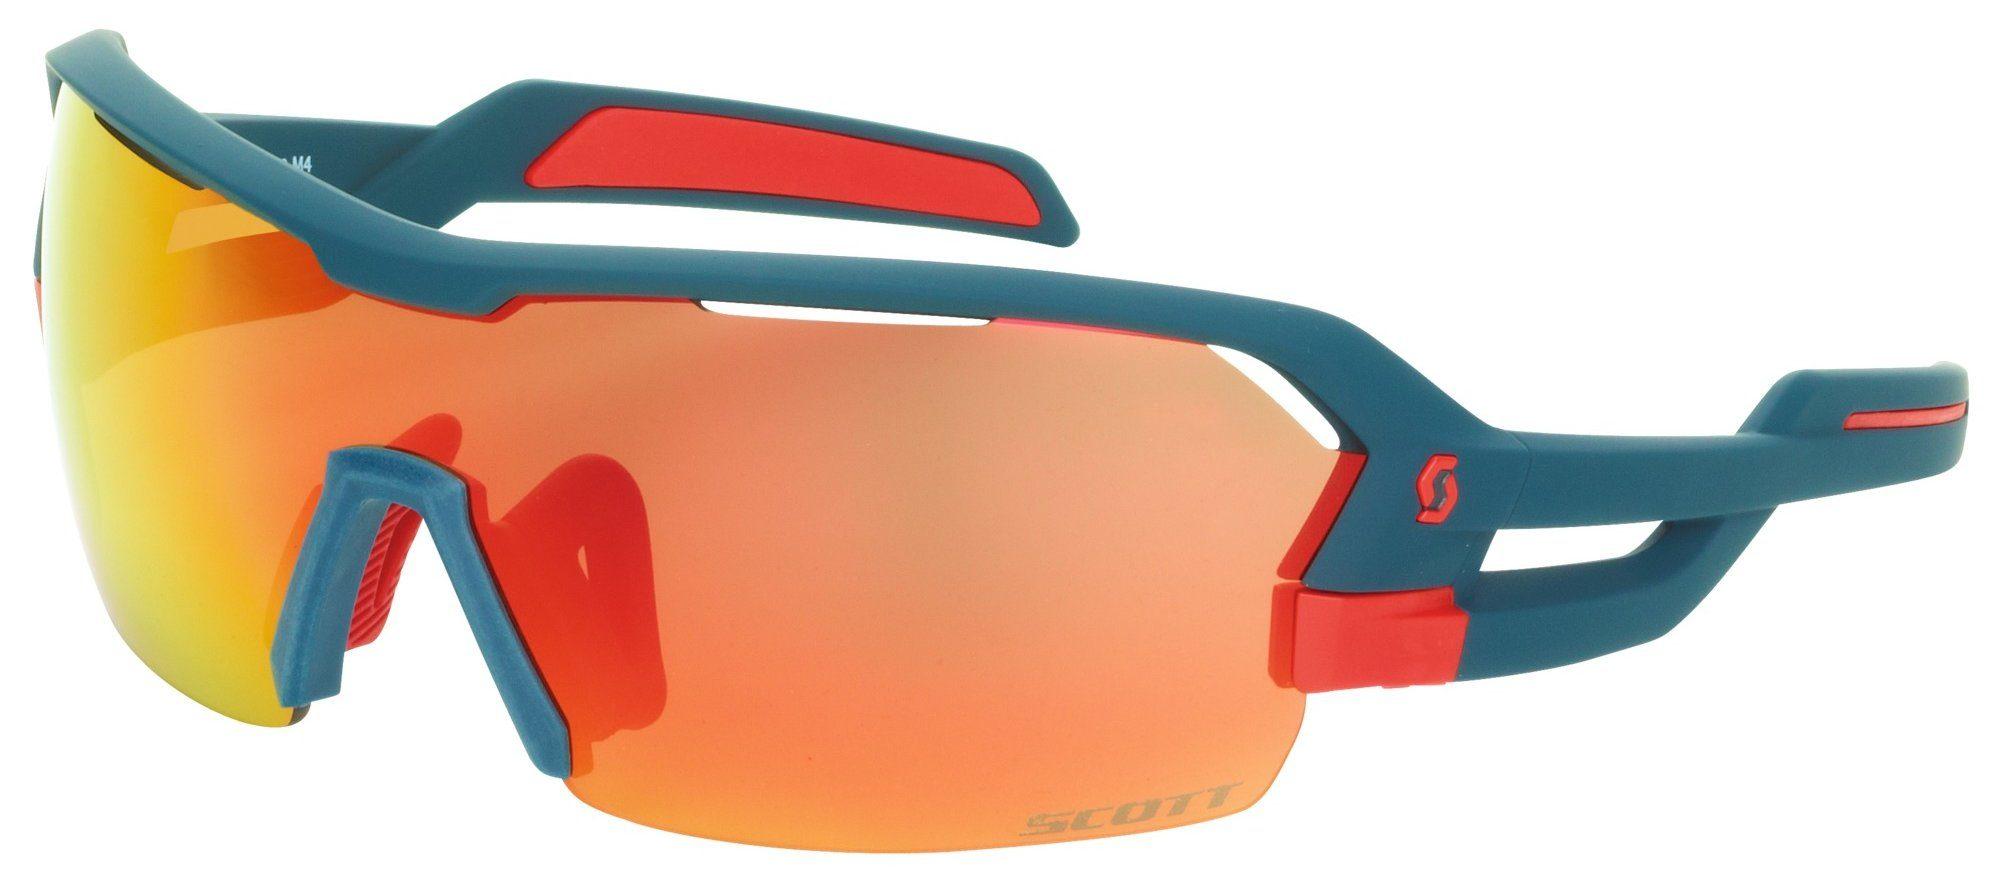 Cykelbriller som gaveide til cykelentutiast